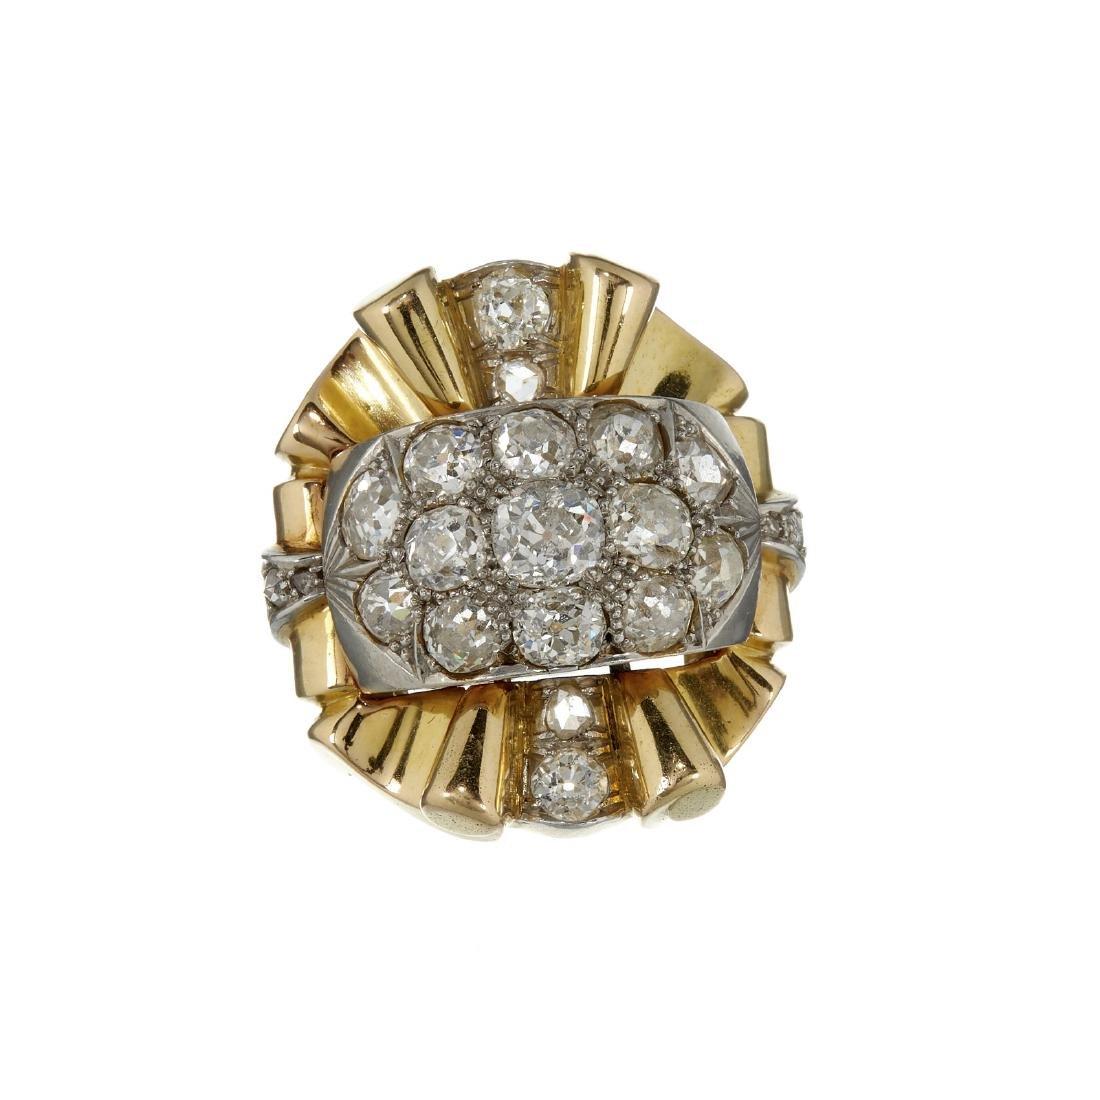 A 1940s Retro diamond dress ring